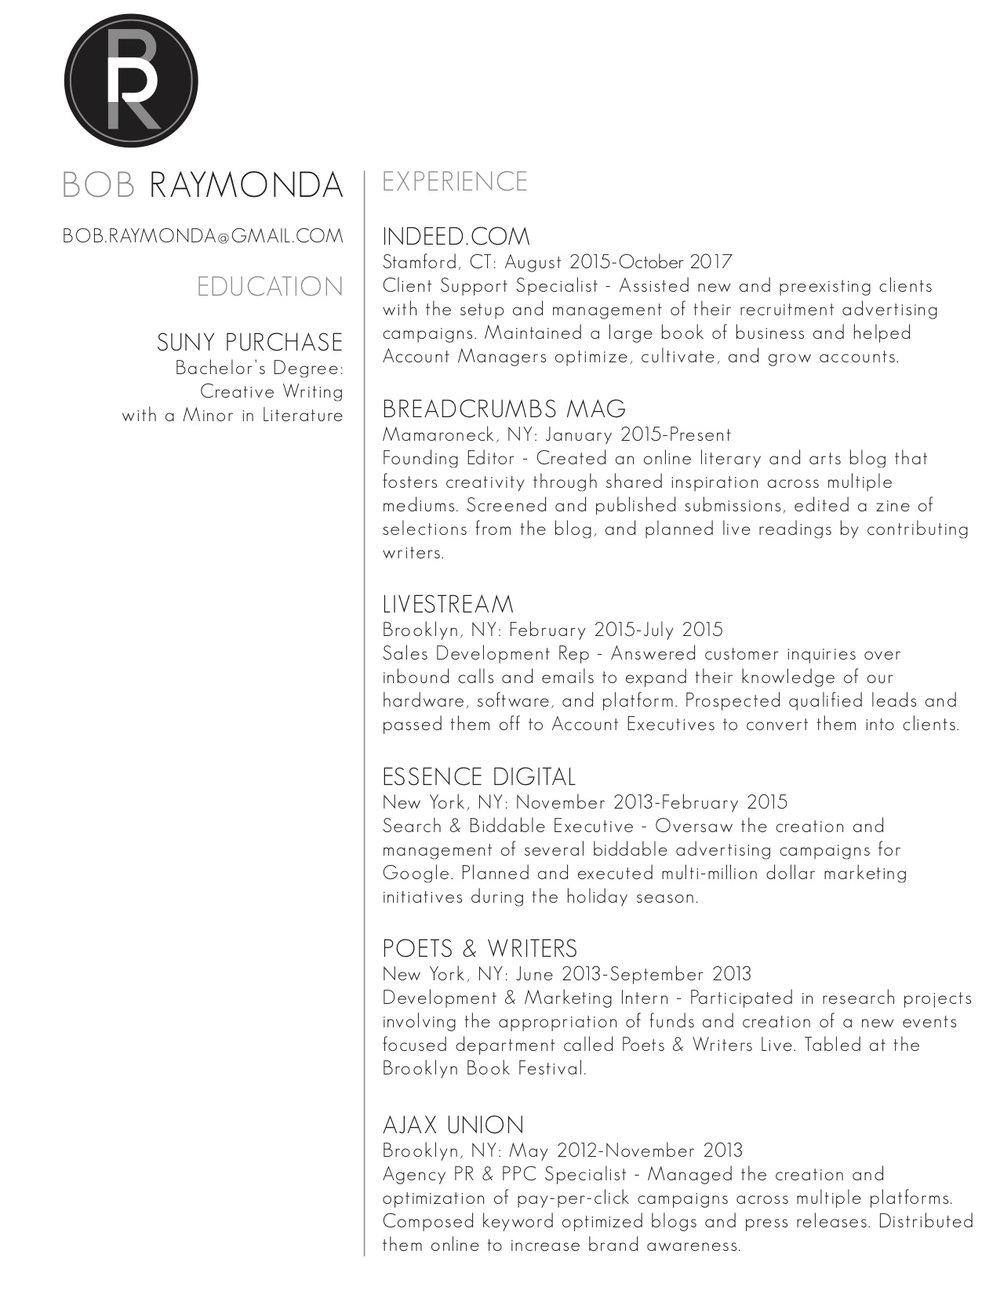 BR Resume.jpg